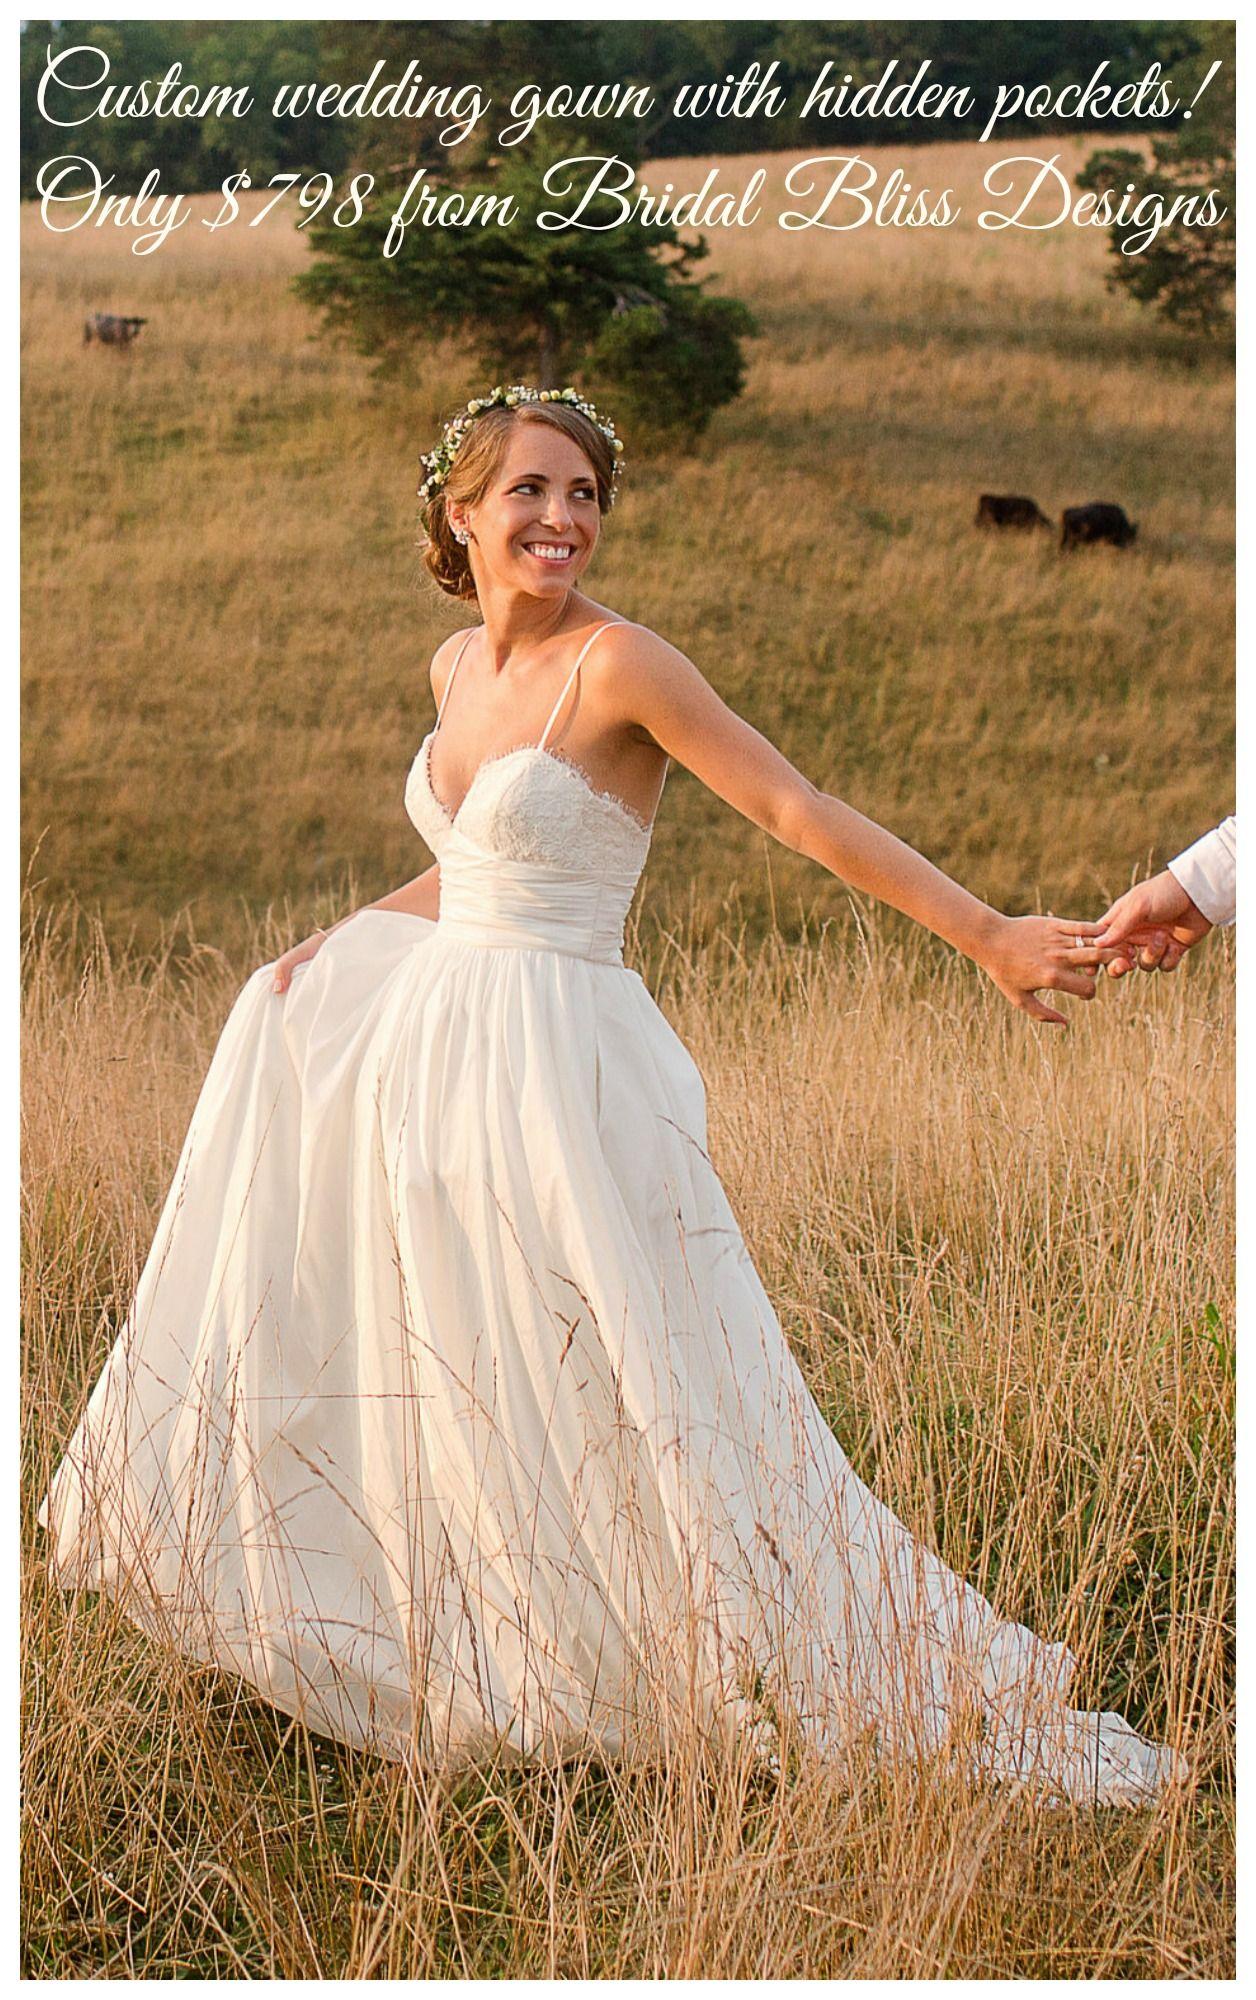 Coco replica wedding dress with hidden pockets wedding pinterest